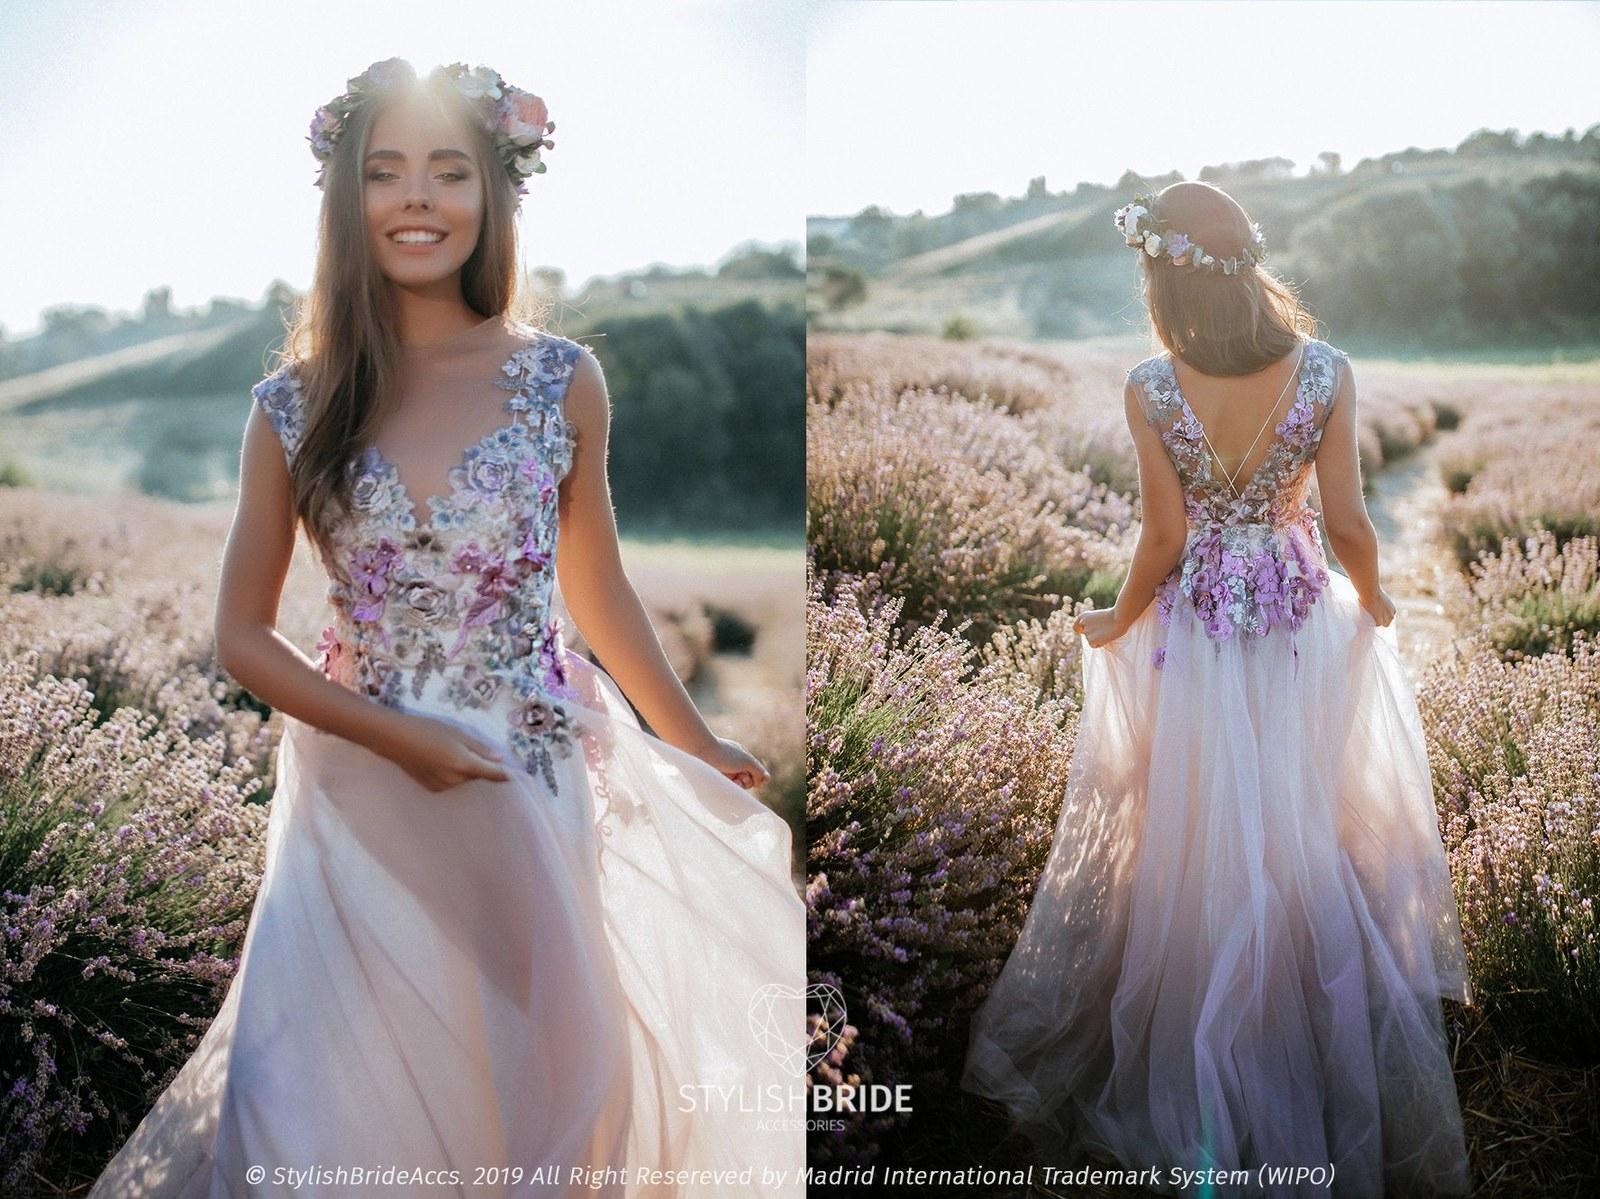 unconventional wedding dress,alternative wedding dresses,